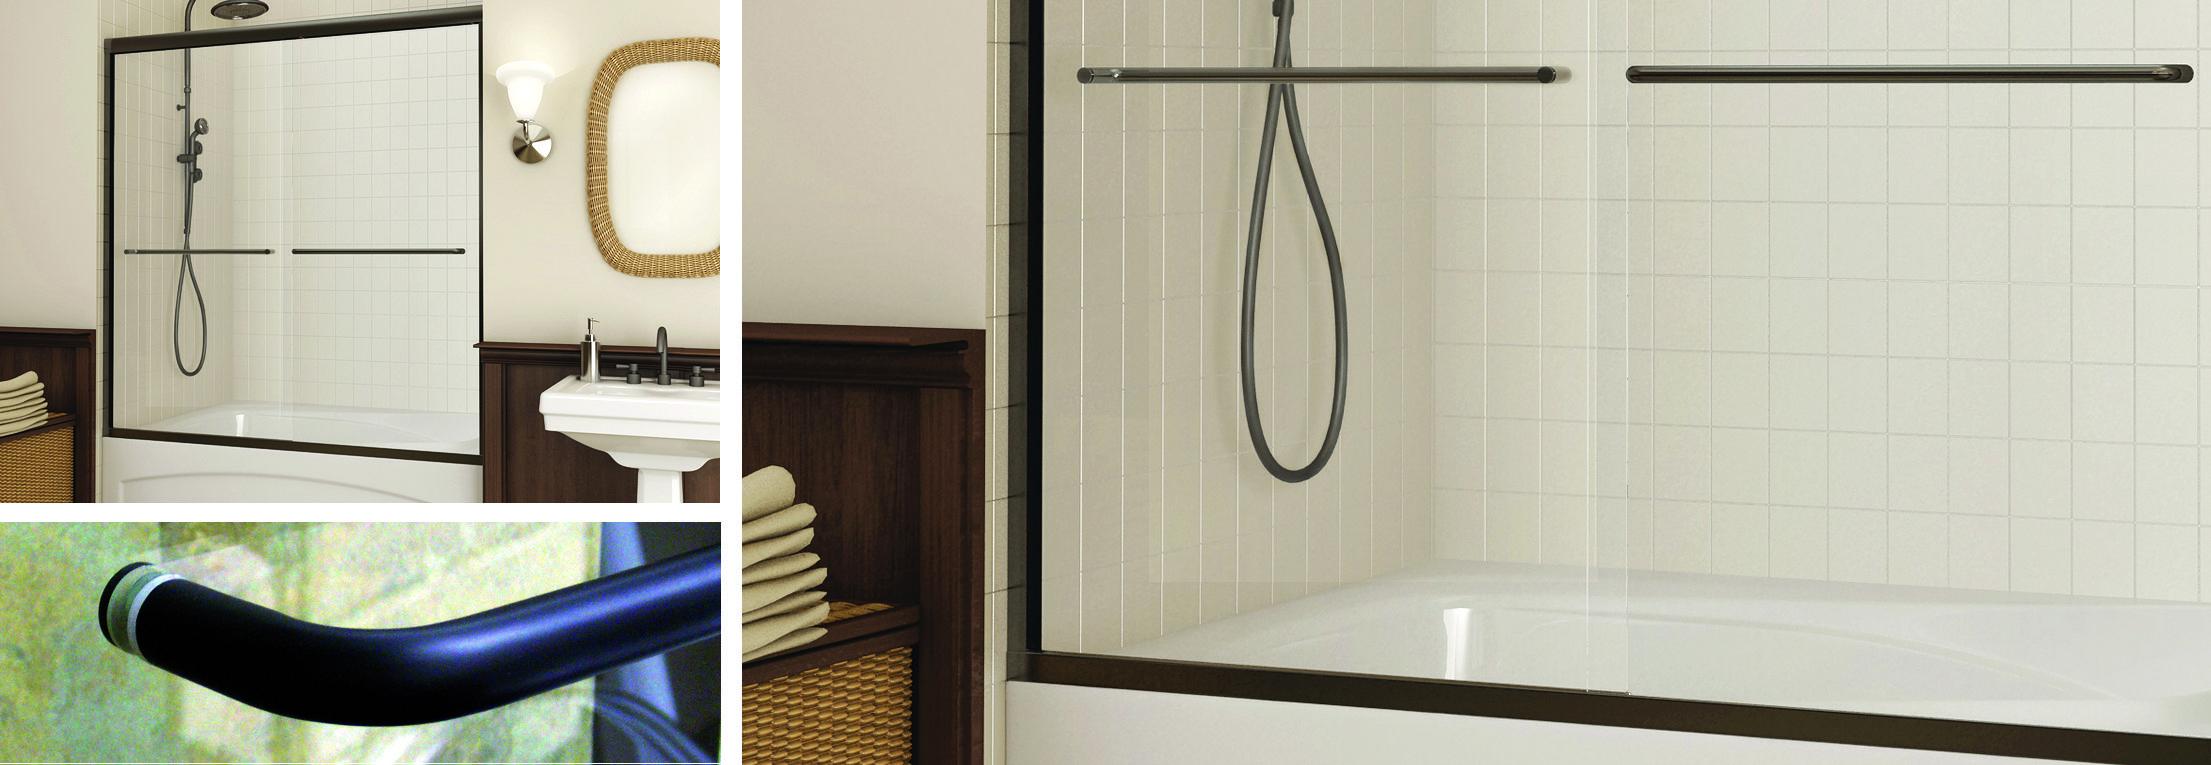 ALLIA TSR-6032 Alcove or Tub showers bathtub - MAAX Professional ...